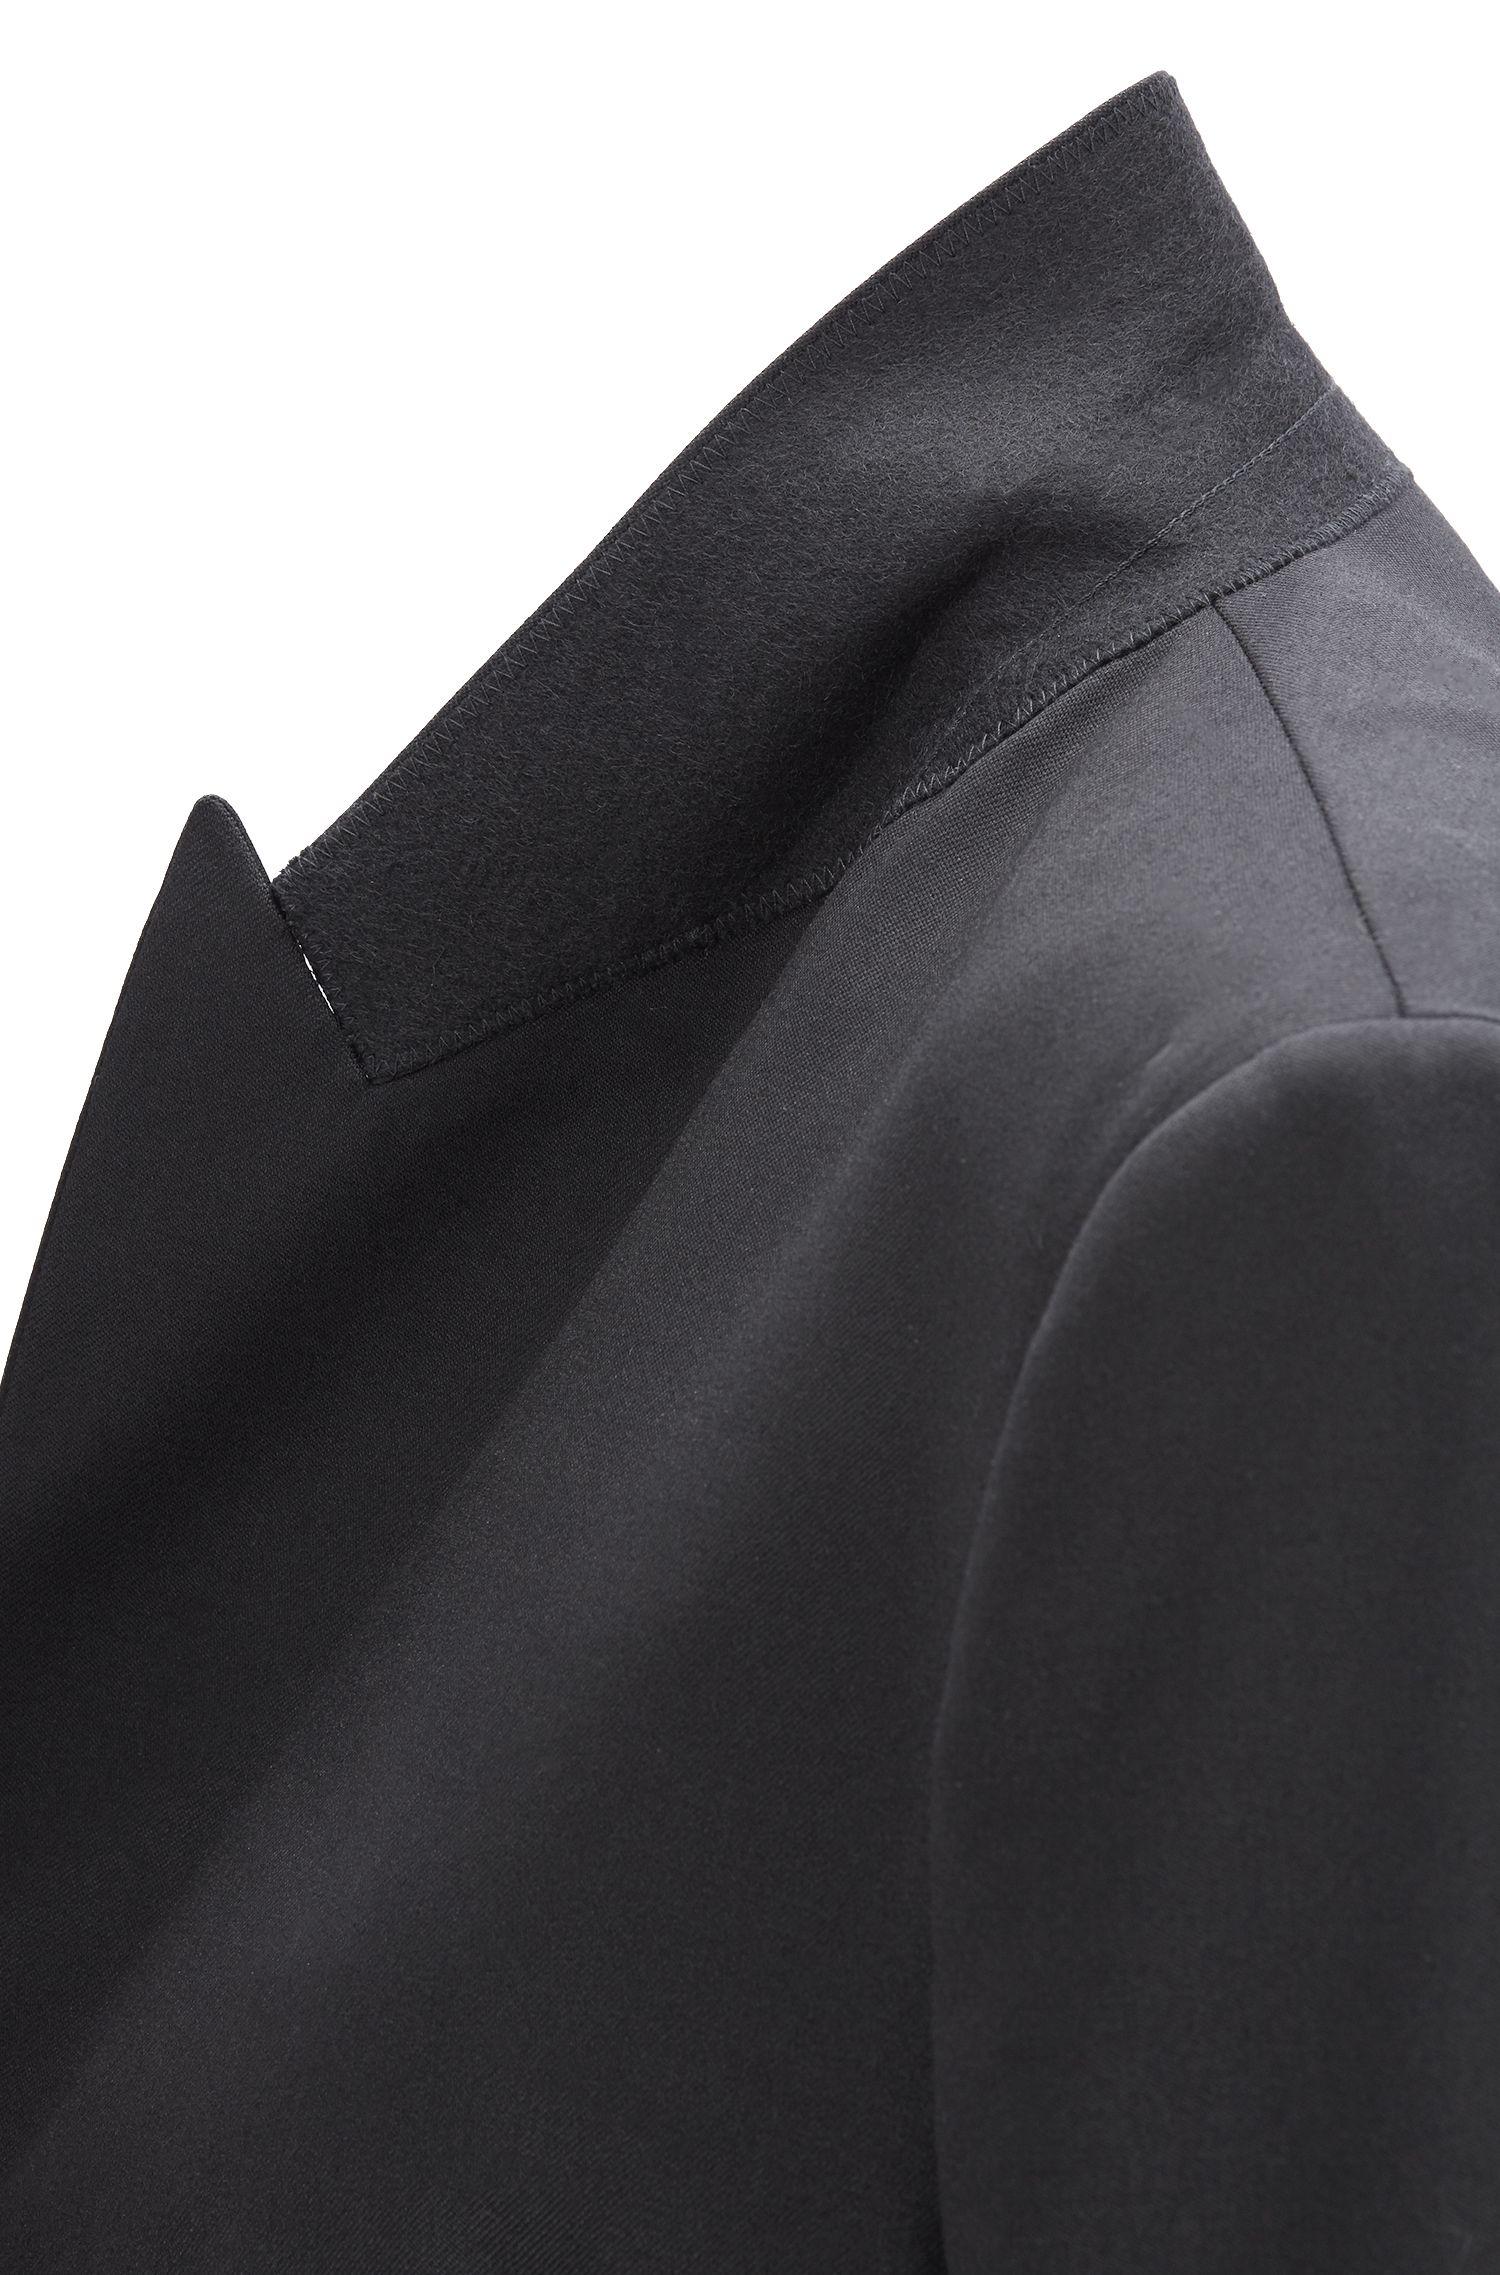 Veste de smoking Oversized Fit en laine vierge stretch italienne, Noir